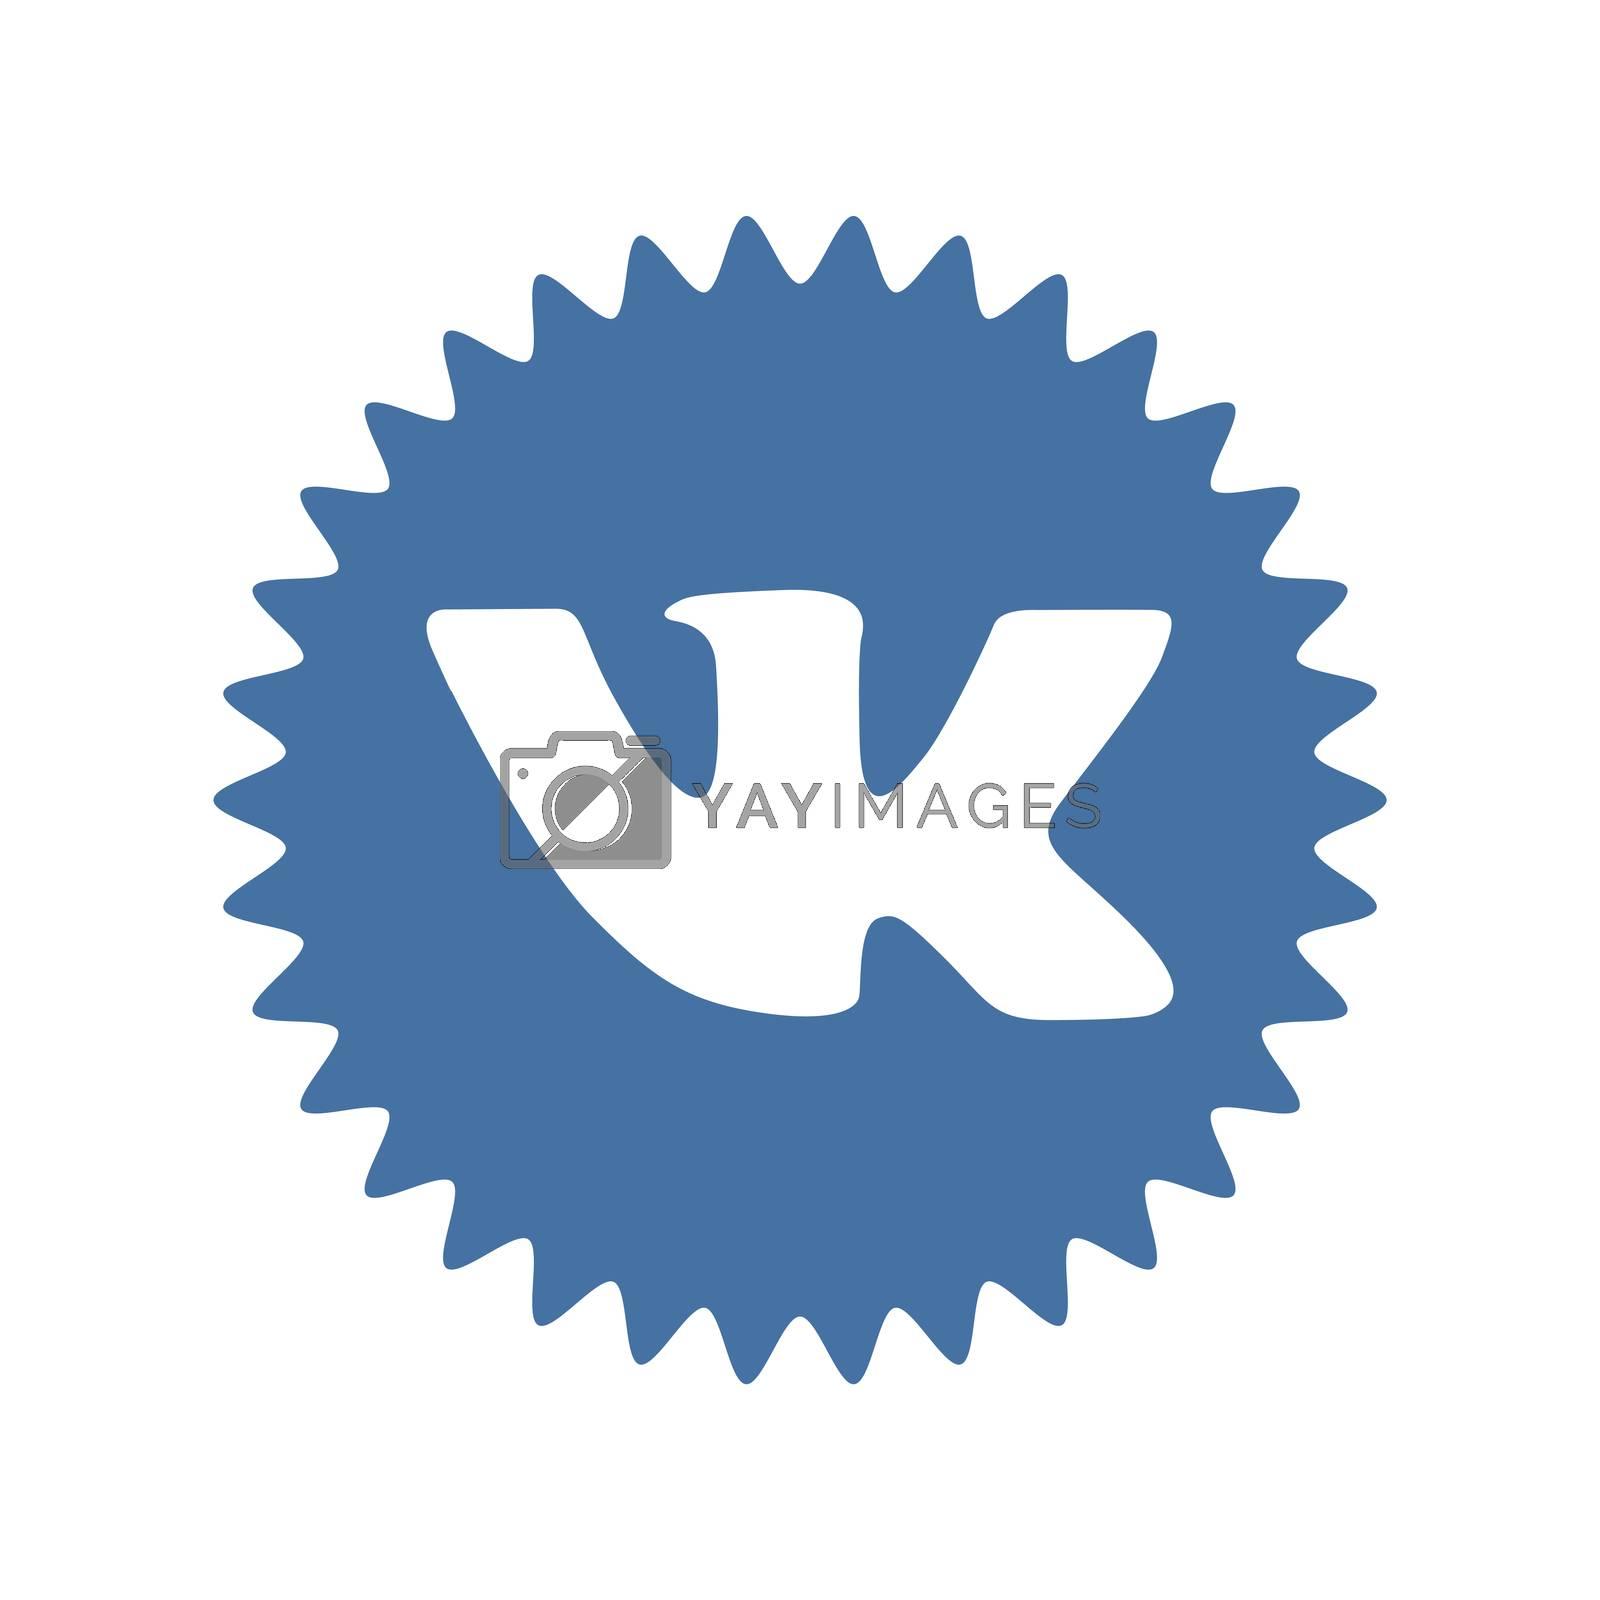 VK logo. Vkontakte is a Russian social media and networking website. VK Vkontakte app . Kharkiv, Ukraine - June, 2020